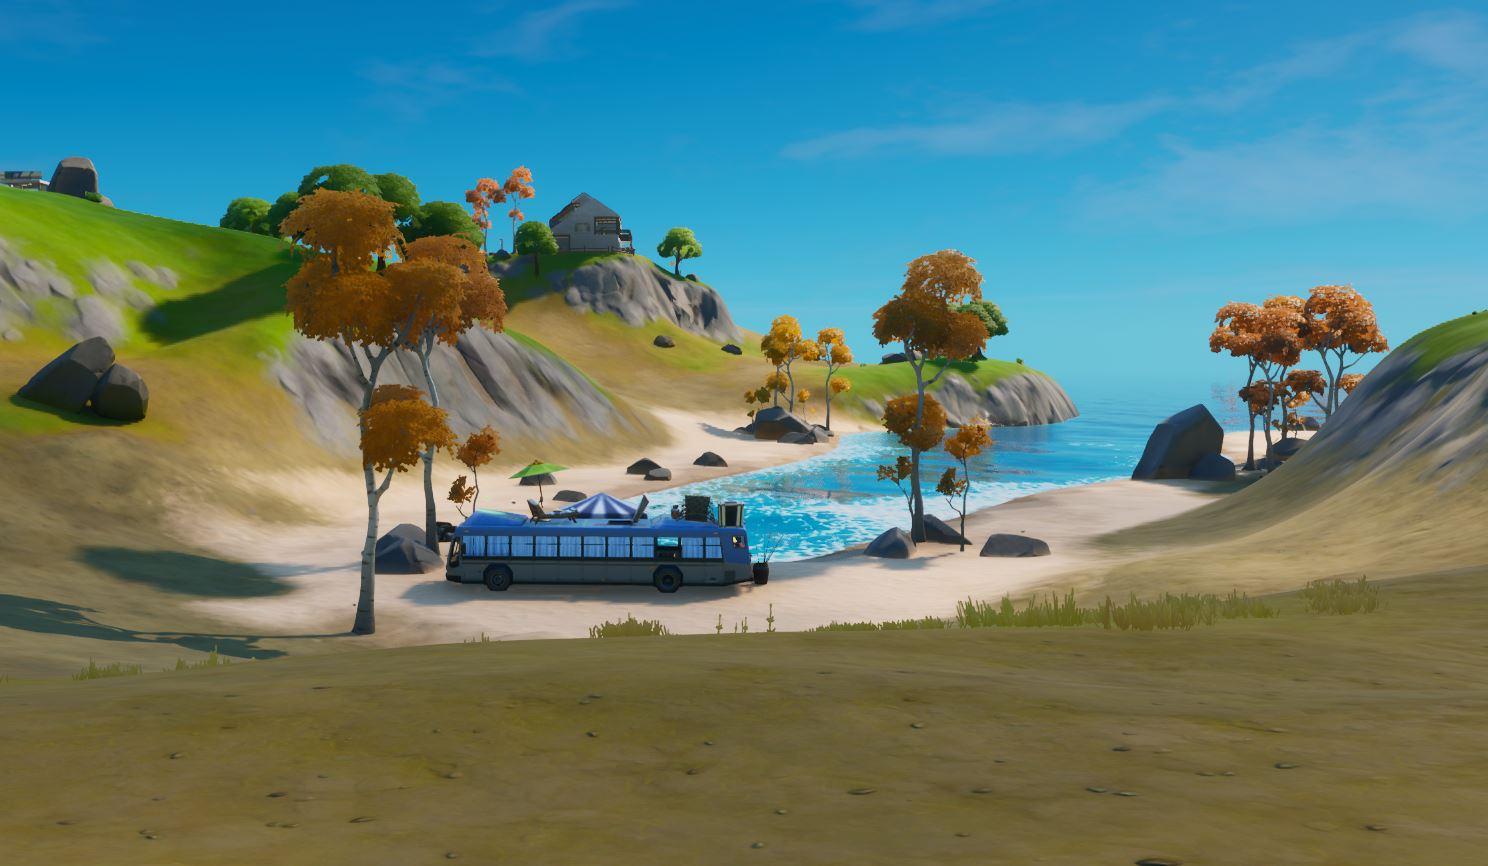 Bailar en Autobus de Playa - Fortnite